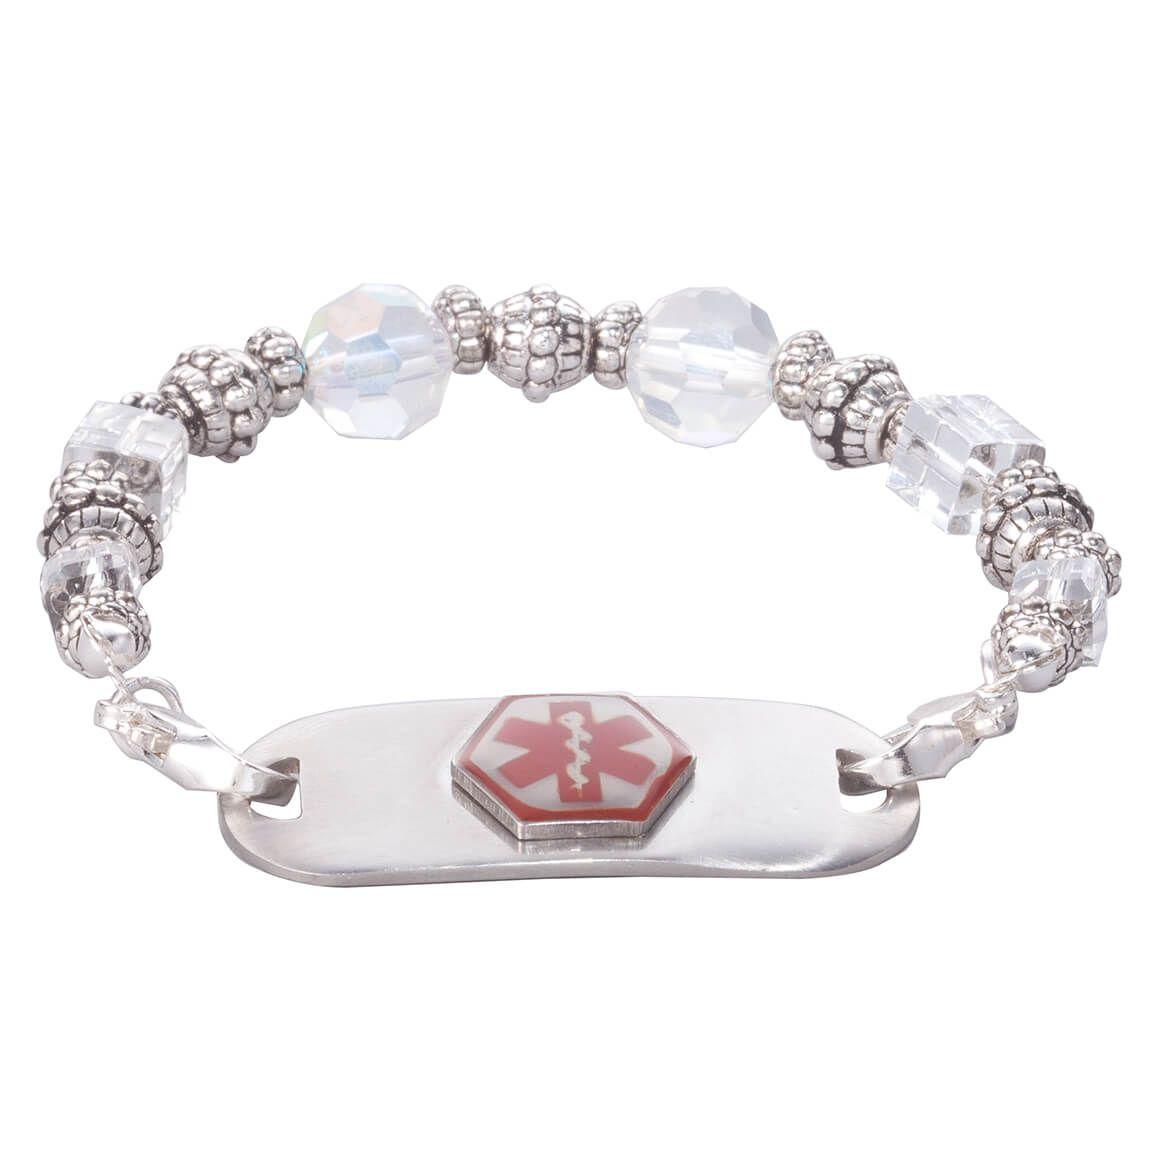 Personalized Medical ID Beaded Bracelet-361637